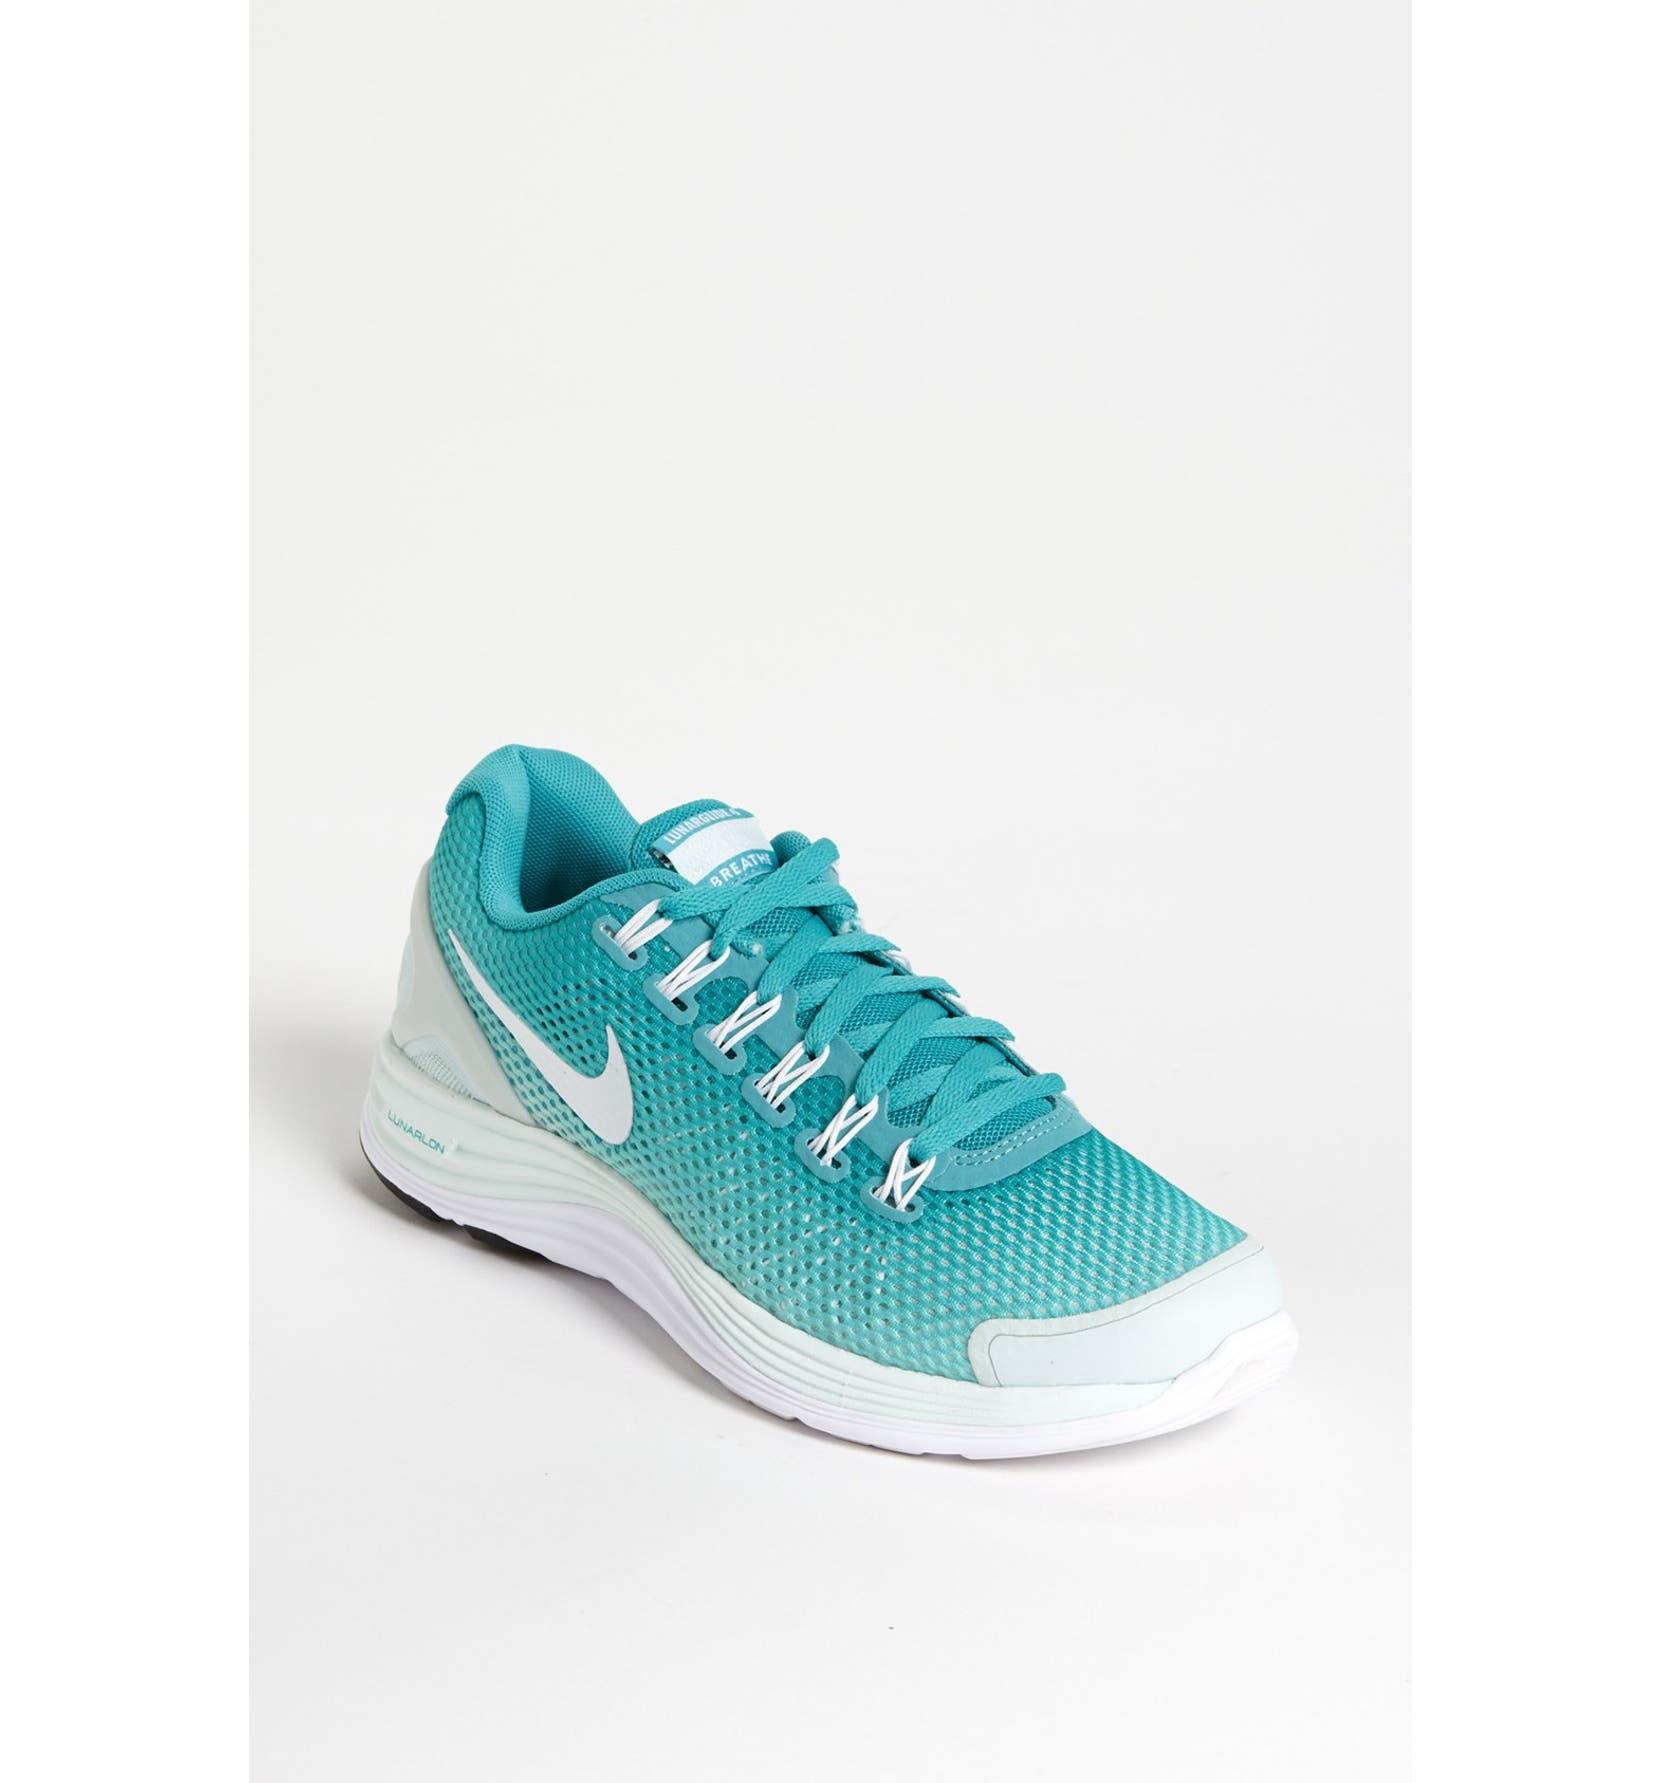 451b5a0d5777 Nike  LunarGlide 4 Breathe  Running Shoe (Women)